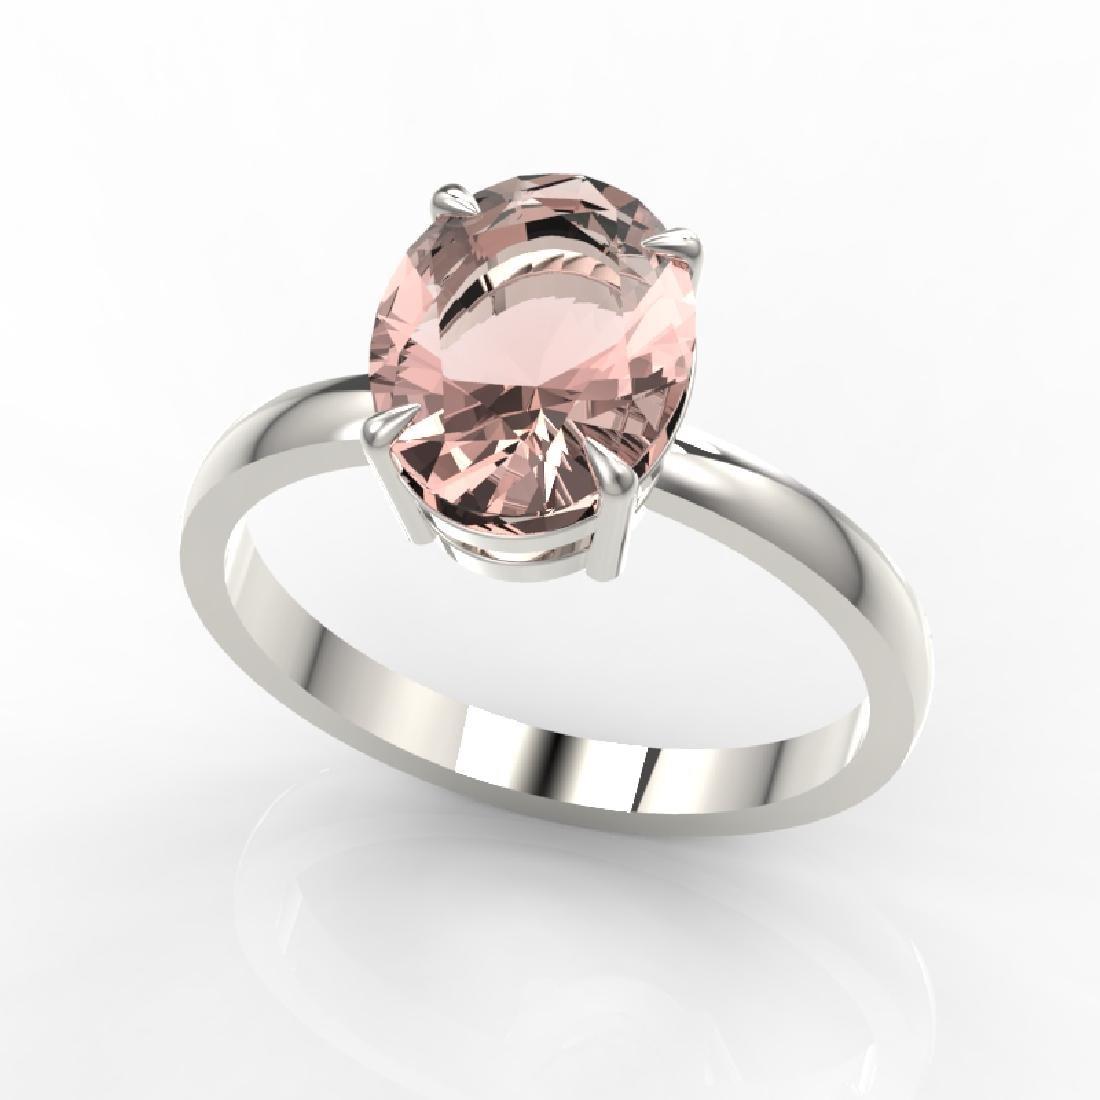 2.75 CTW Morganite Designer Inspired Solitaire Ring 18K - 2